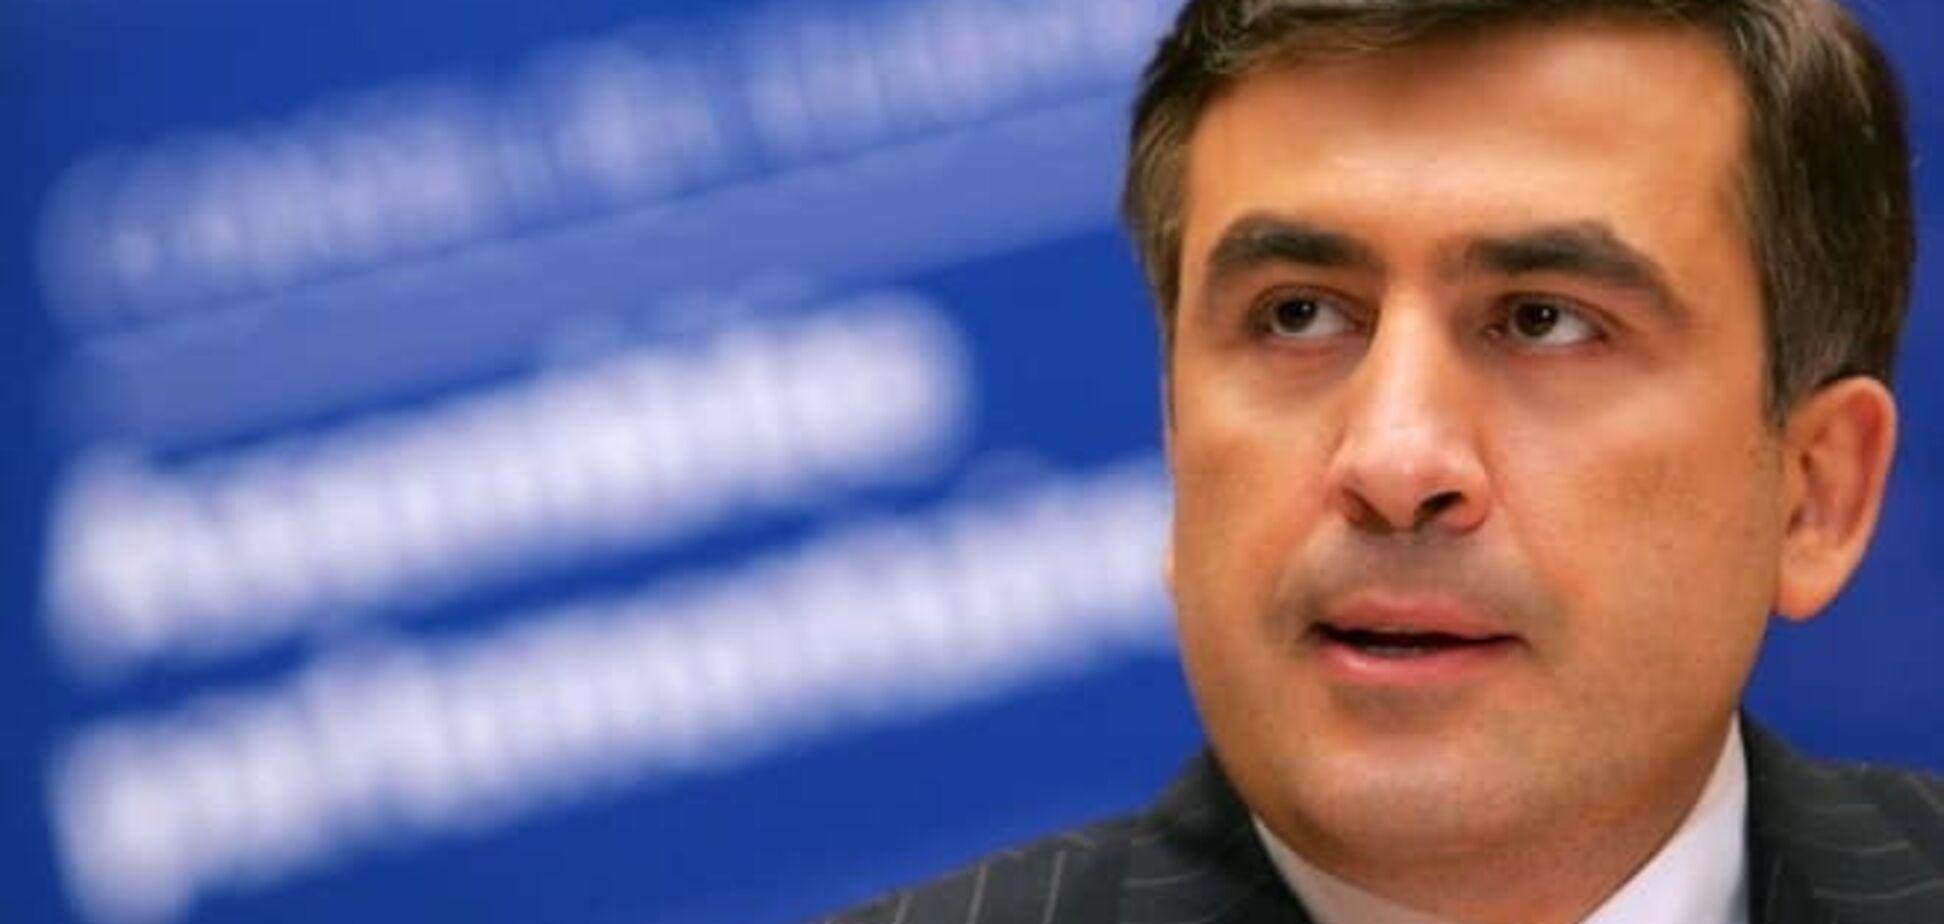 Грузинский суд оставил в силе арест Саакашвили